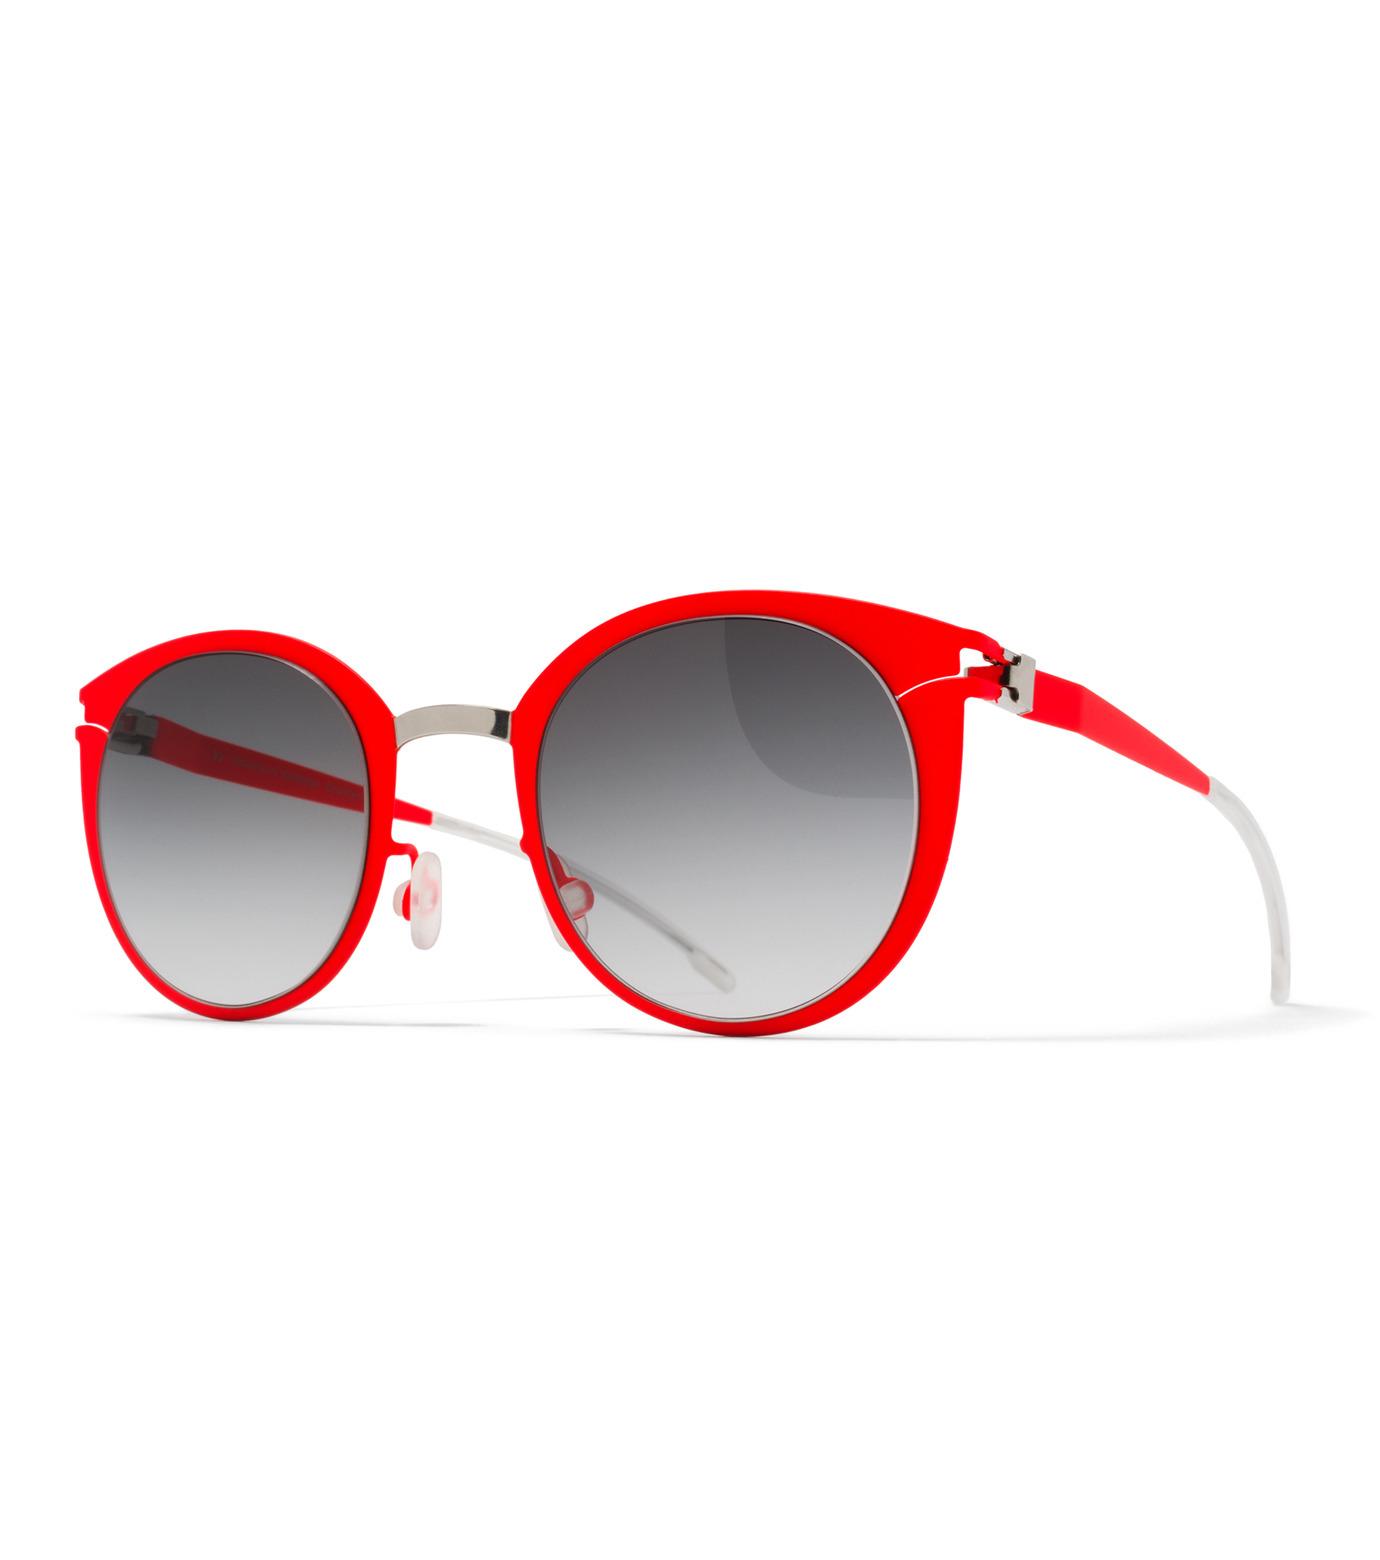 MYKITA(マイキータ)のDODO-RED(アイウェア/eyewear)-DODO-62 拡大詳細画像1